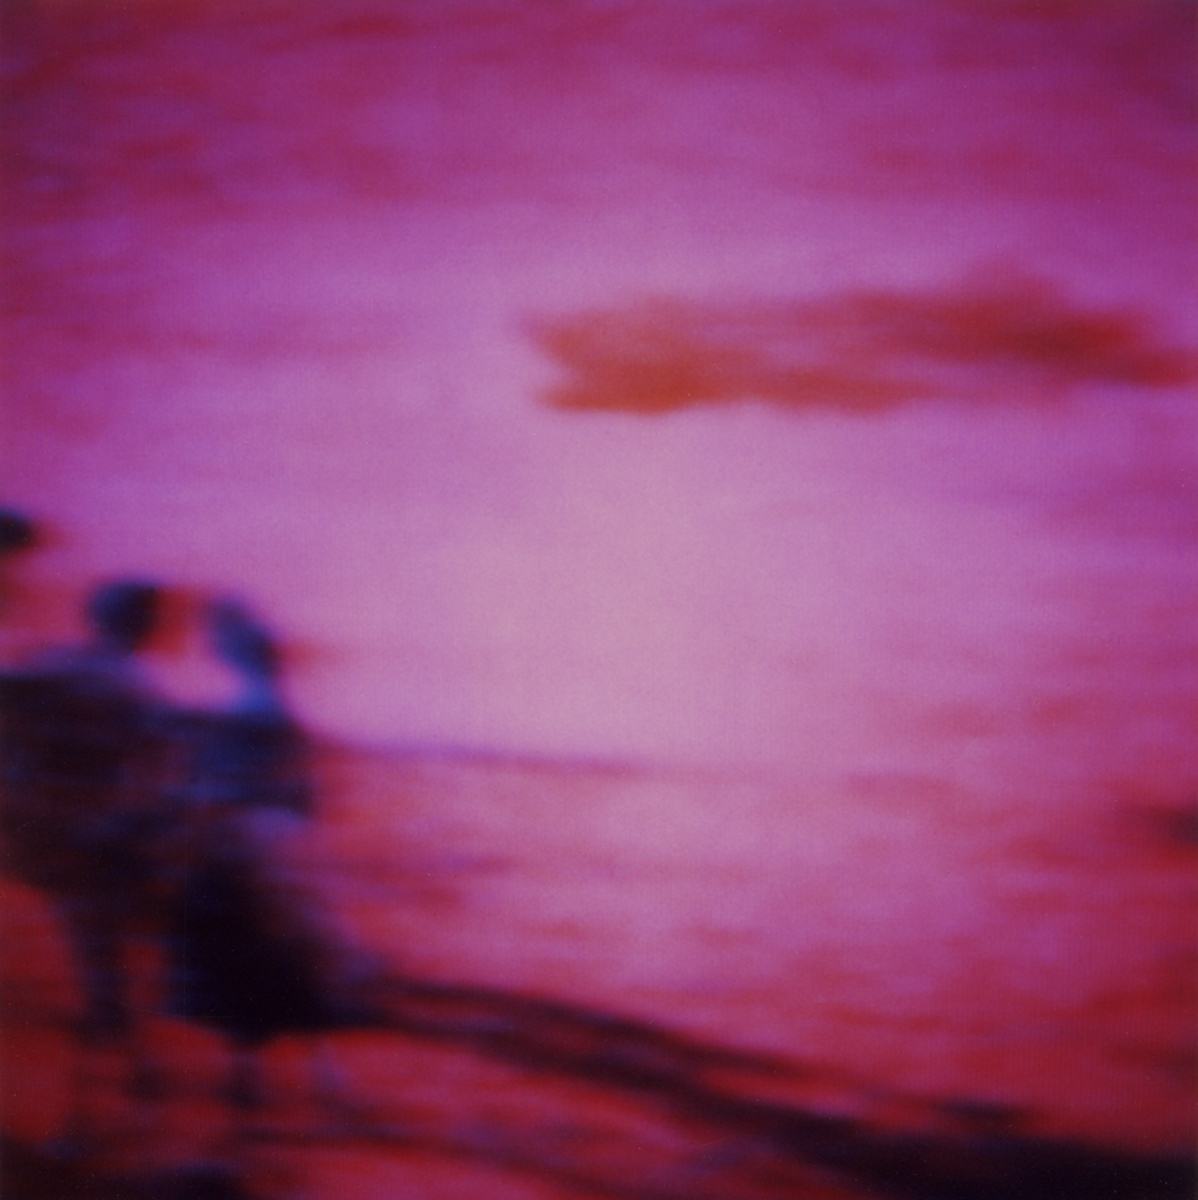 Television-TV-Polaroid-SX70-Couple-Romance.jpg